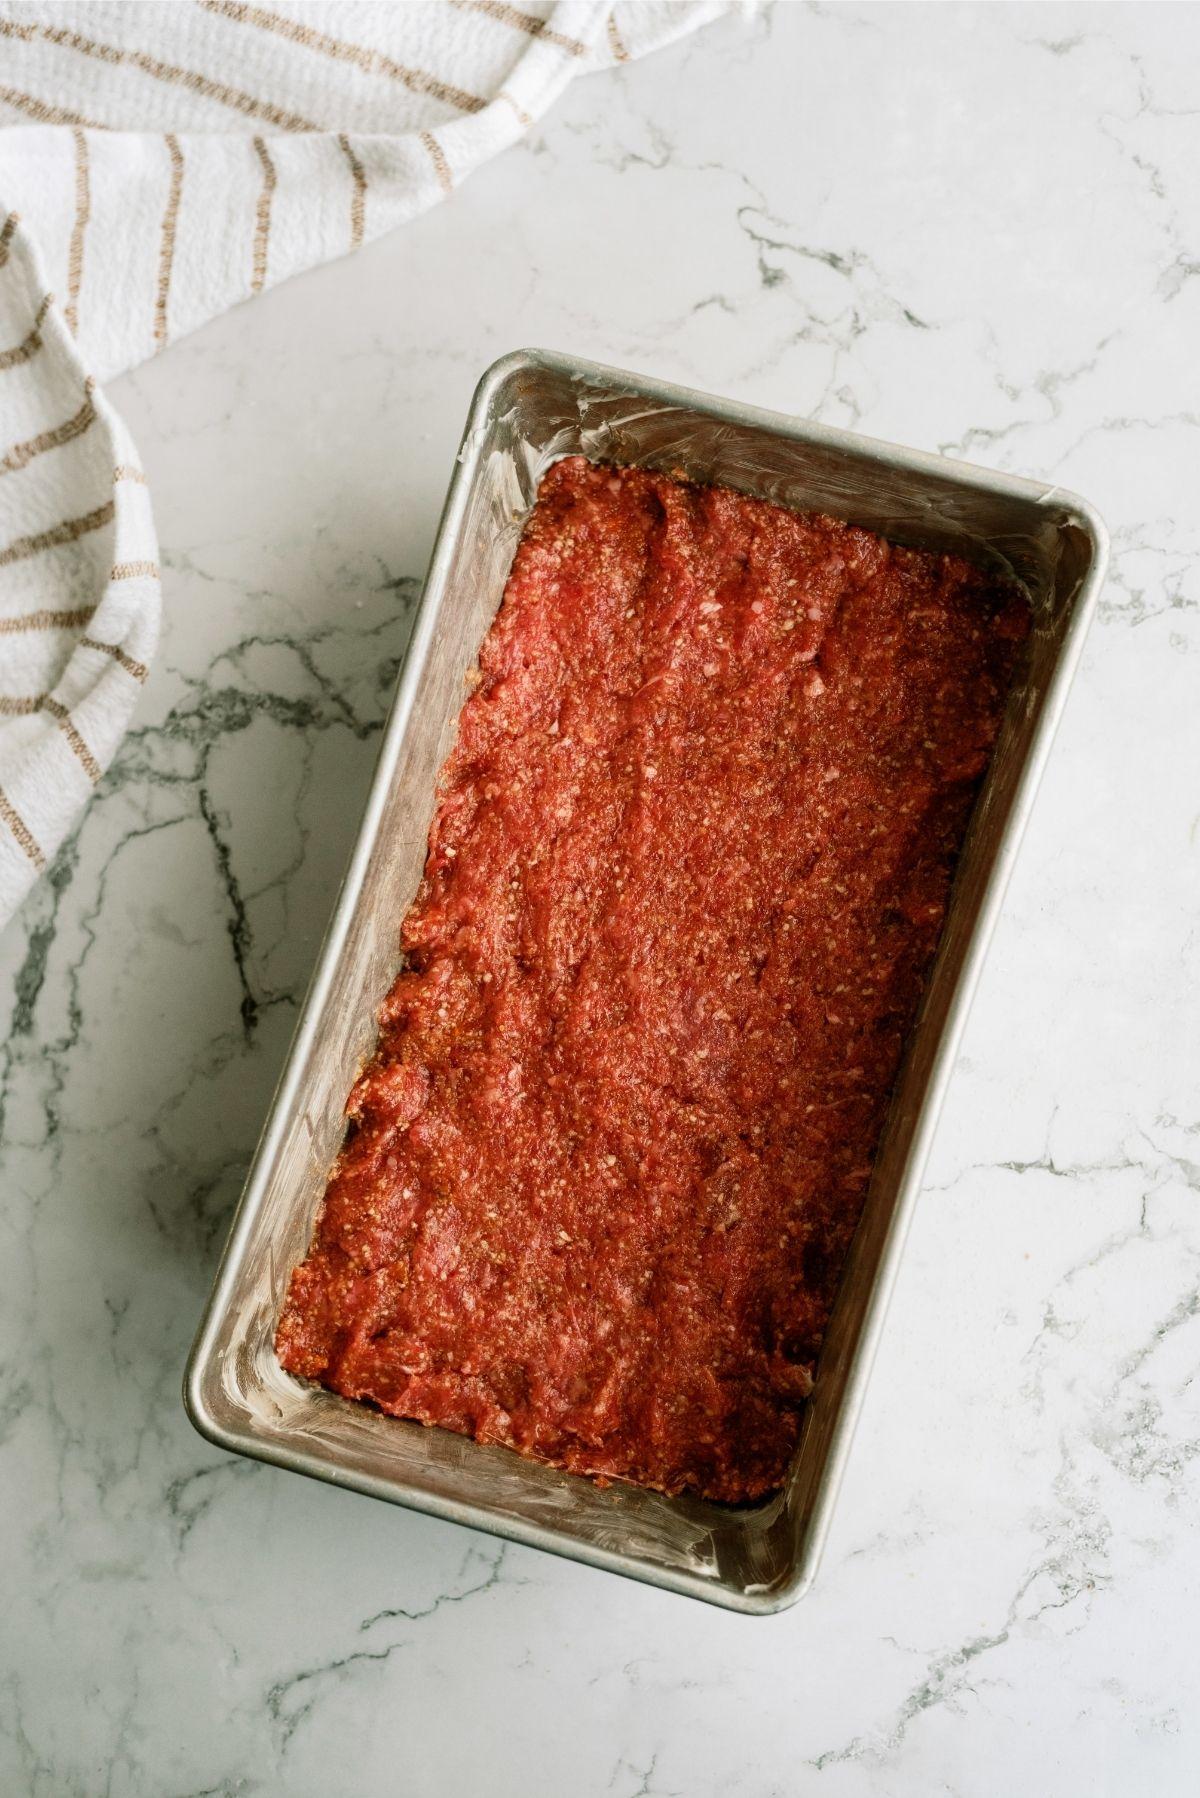 Meatloaf mixture pressed into a loaf pan